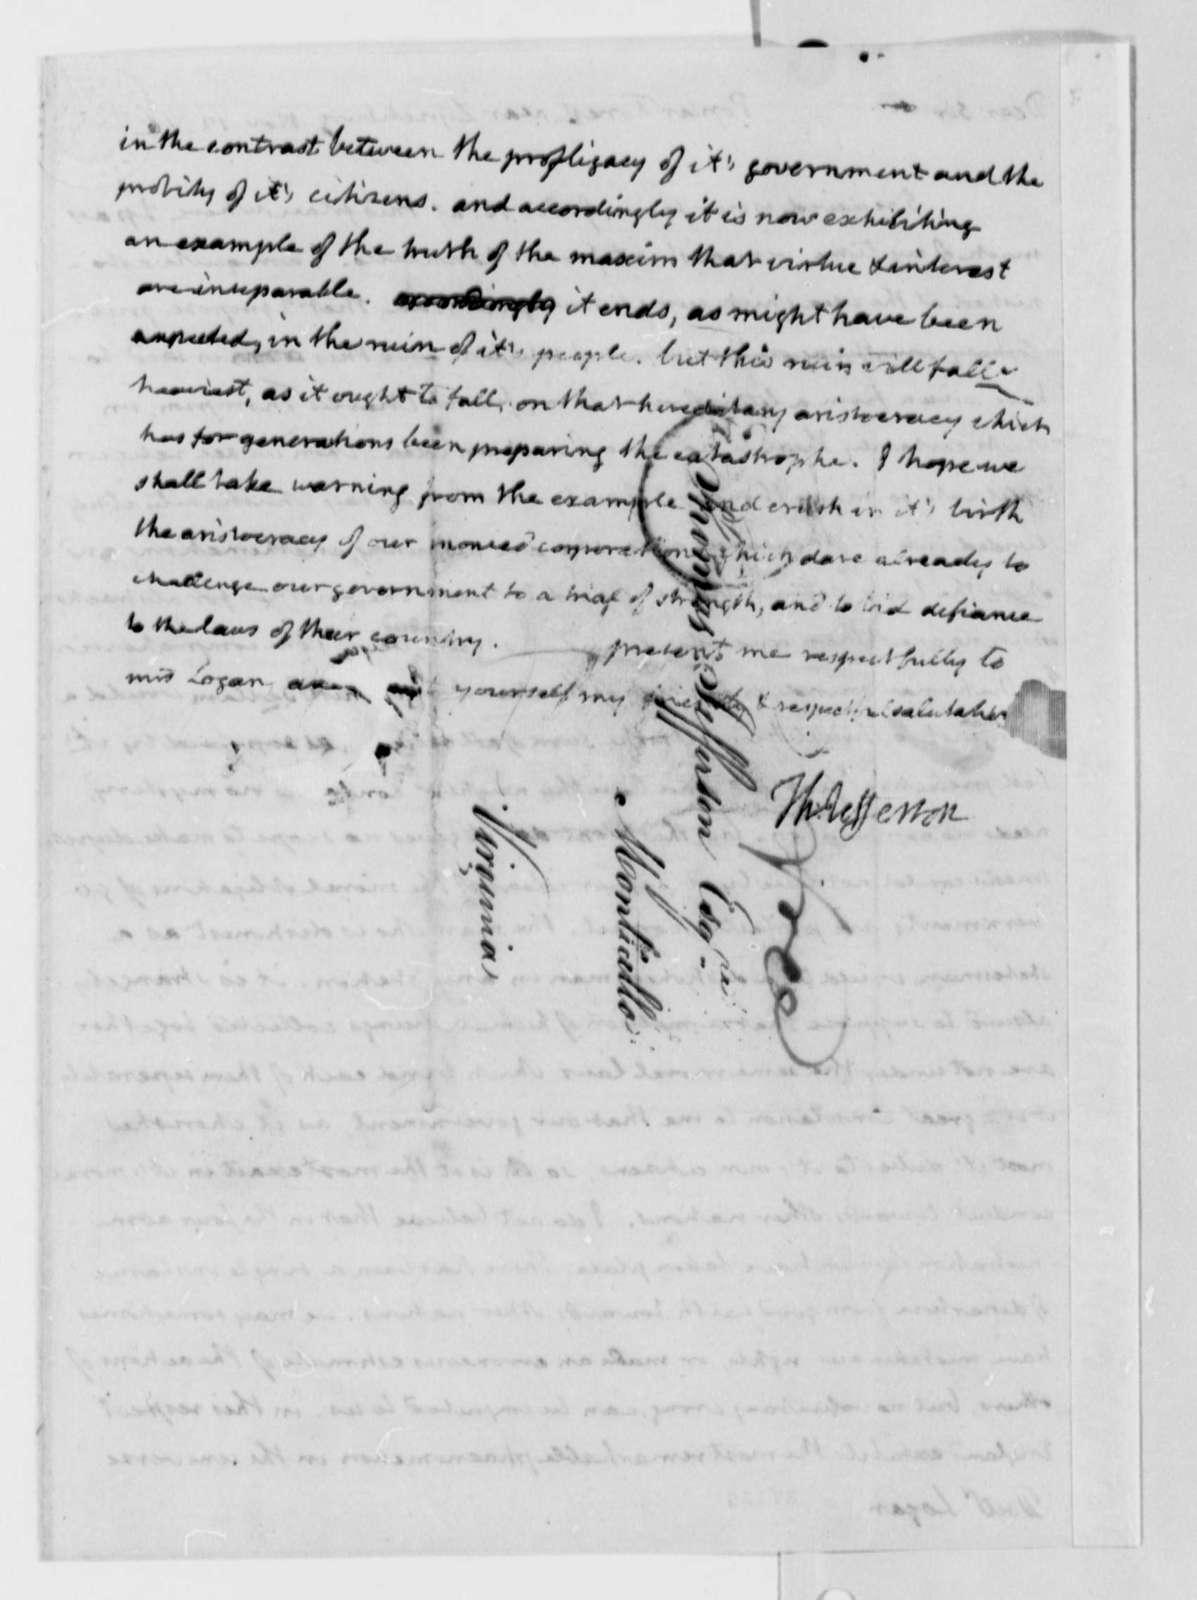 Thomas Jefferson to George Logan, November 12, 1816